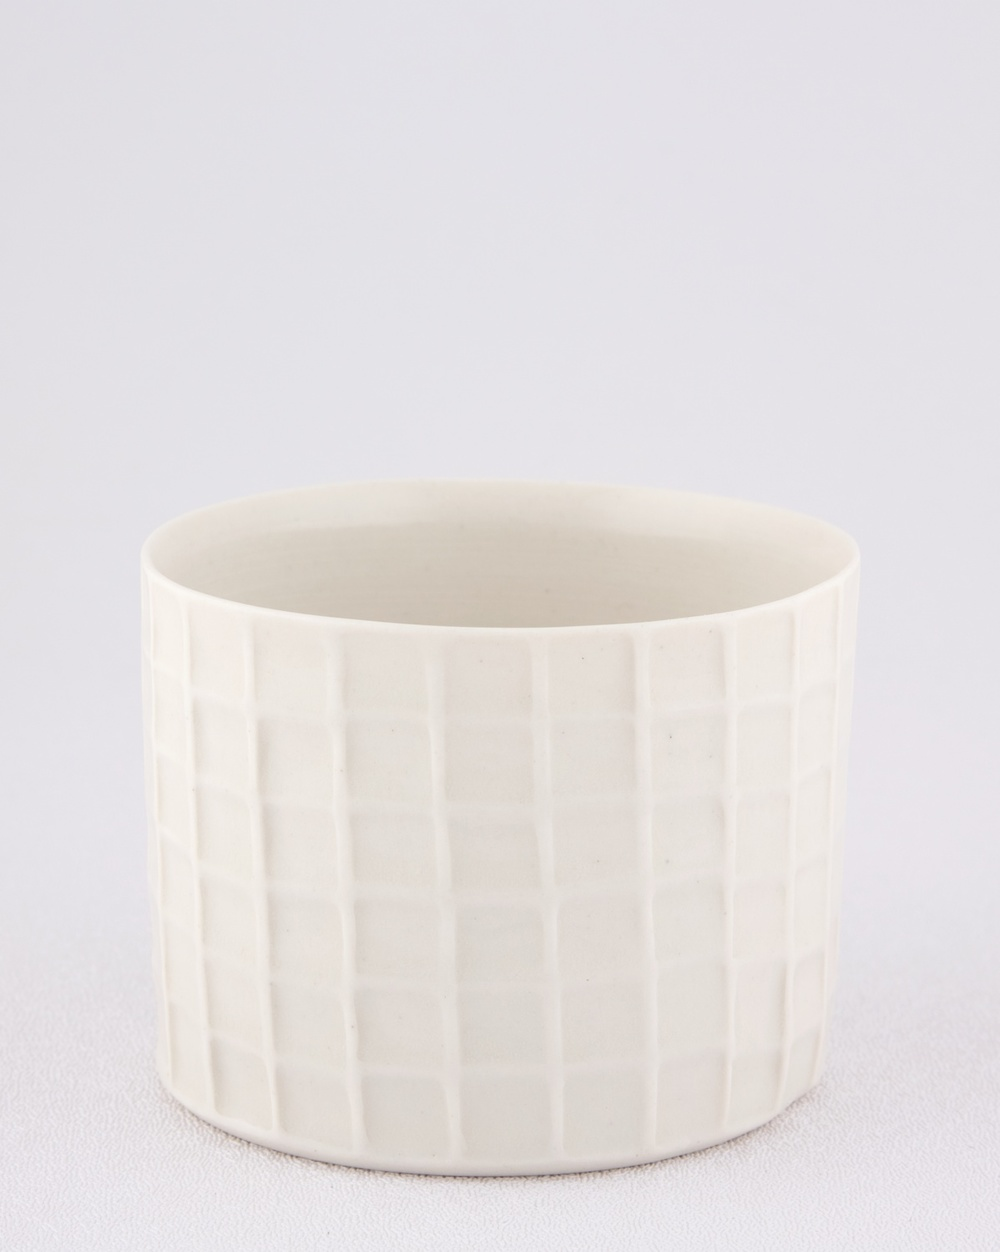 "Shio Kusaka Untitled (cup) 2009 Porcelain 2 5/8"" x 3 1/2"" SK016"